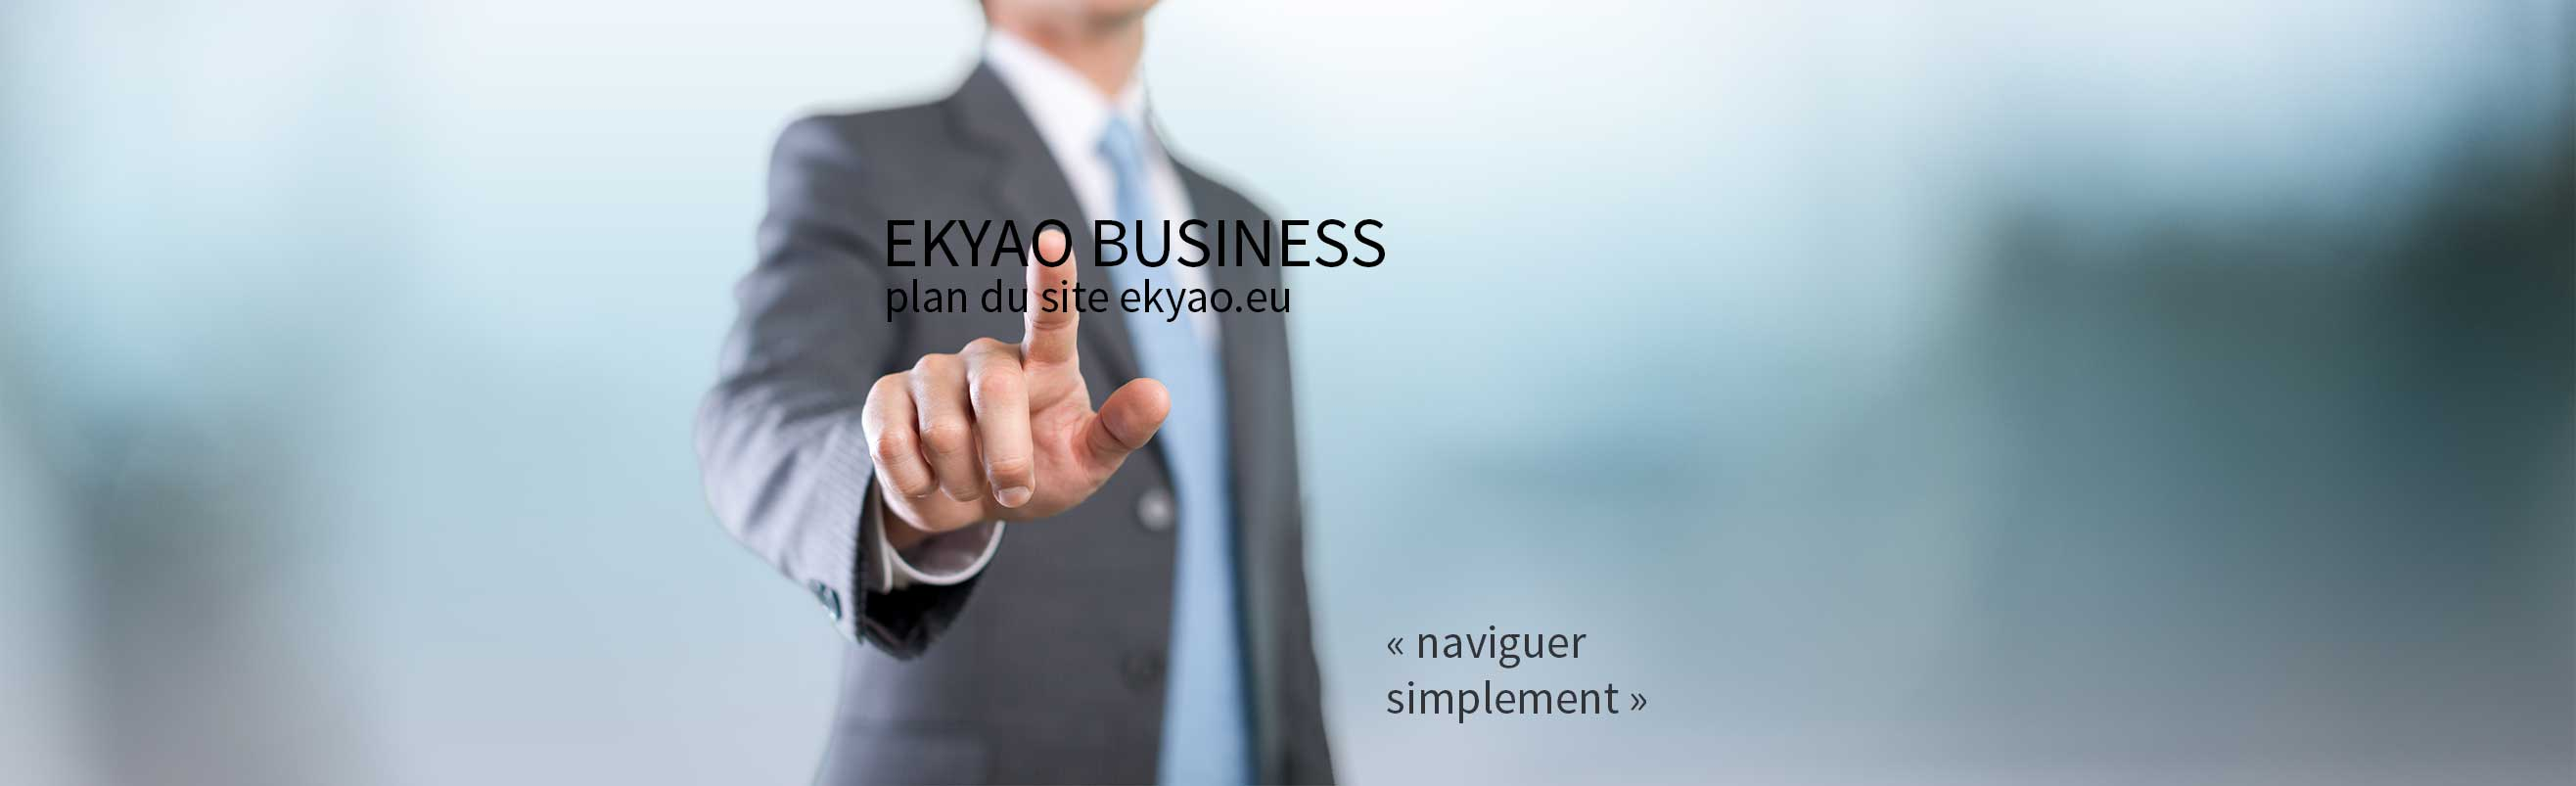 Ekyao Business - Plan du site. Naviguer simplement sur Ekyao.eu